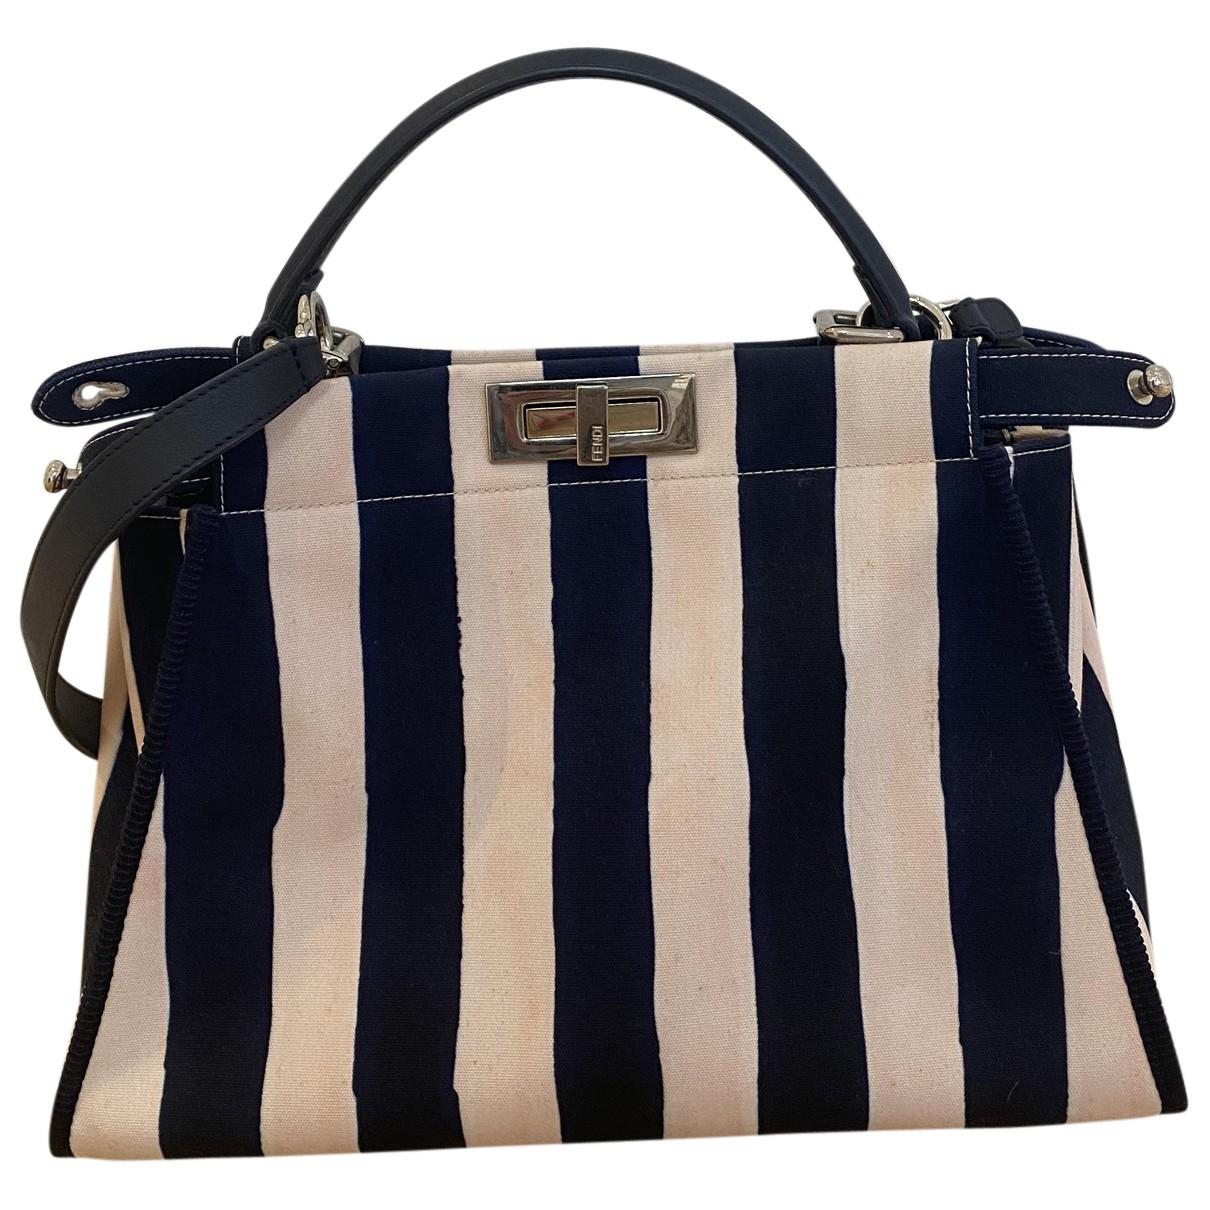 Fendi Peekaboo Pink Cloth handbag for Women N